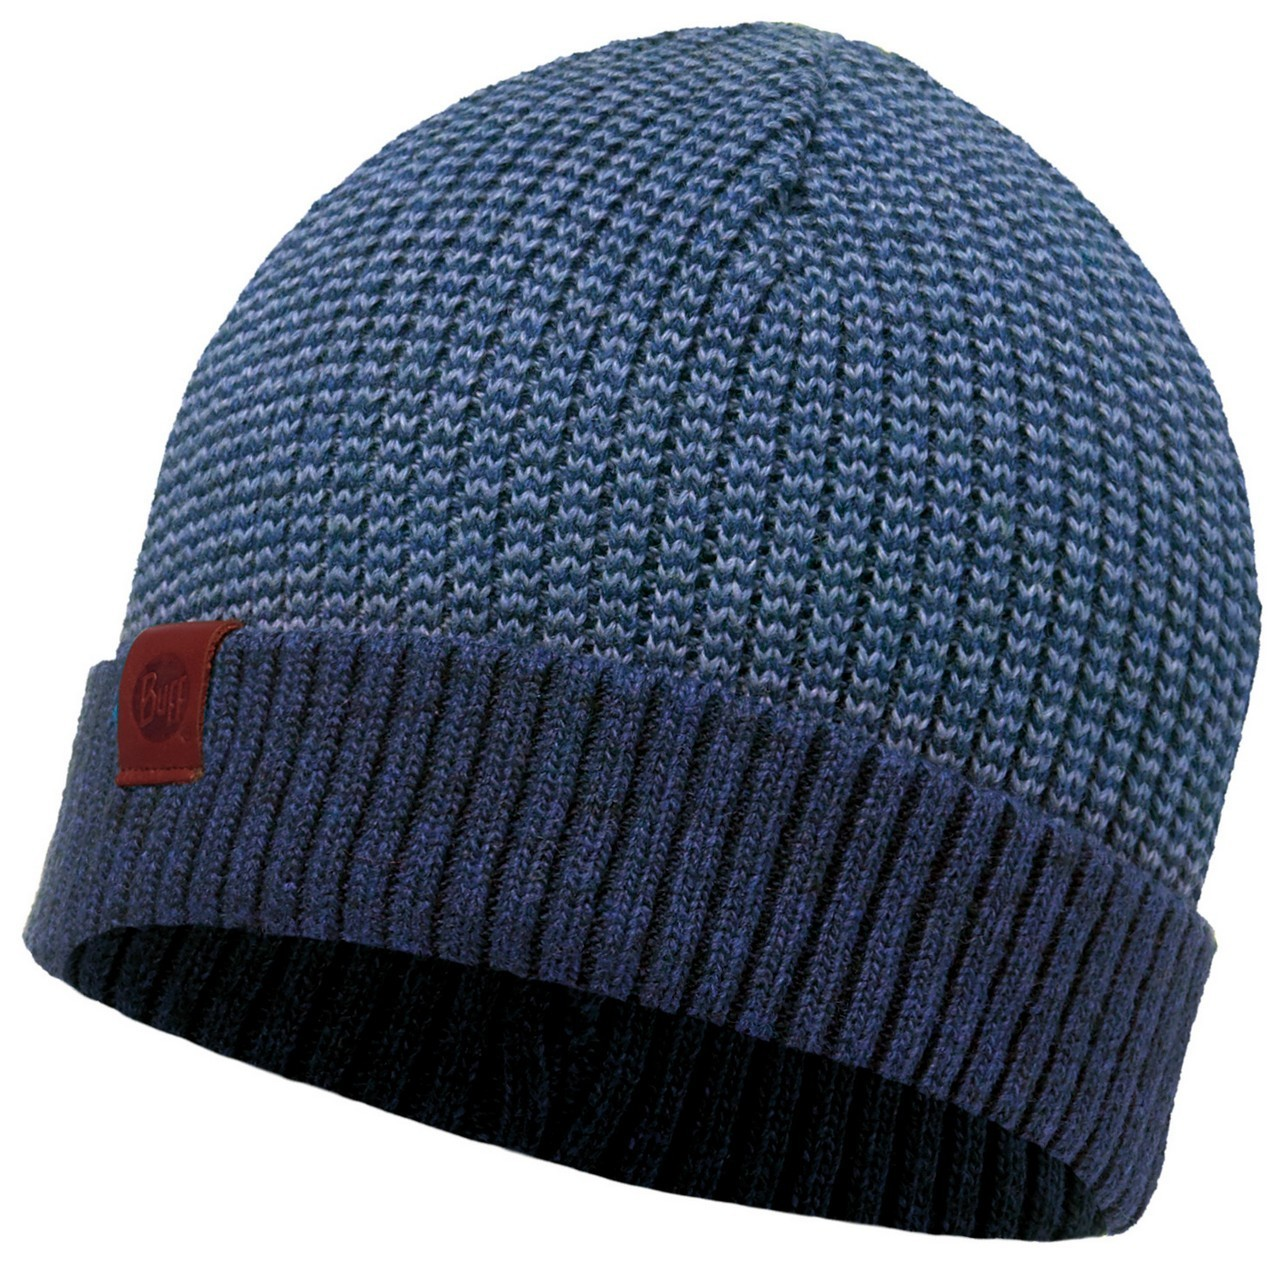 Шапки с отворотом Вязаная шапка Buff Dee Blue 116046.707.10.00.jpg